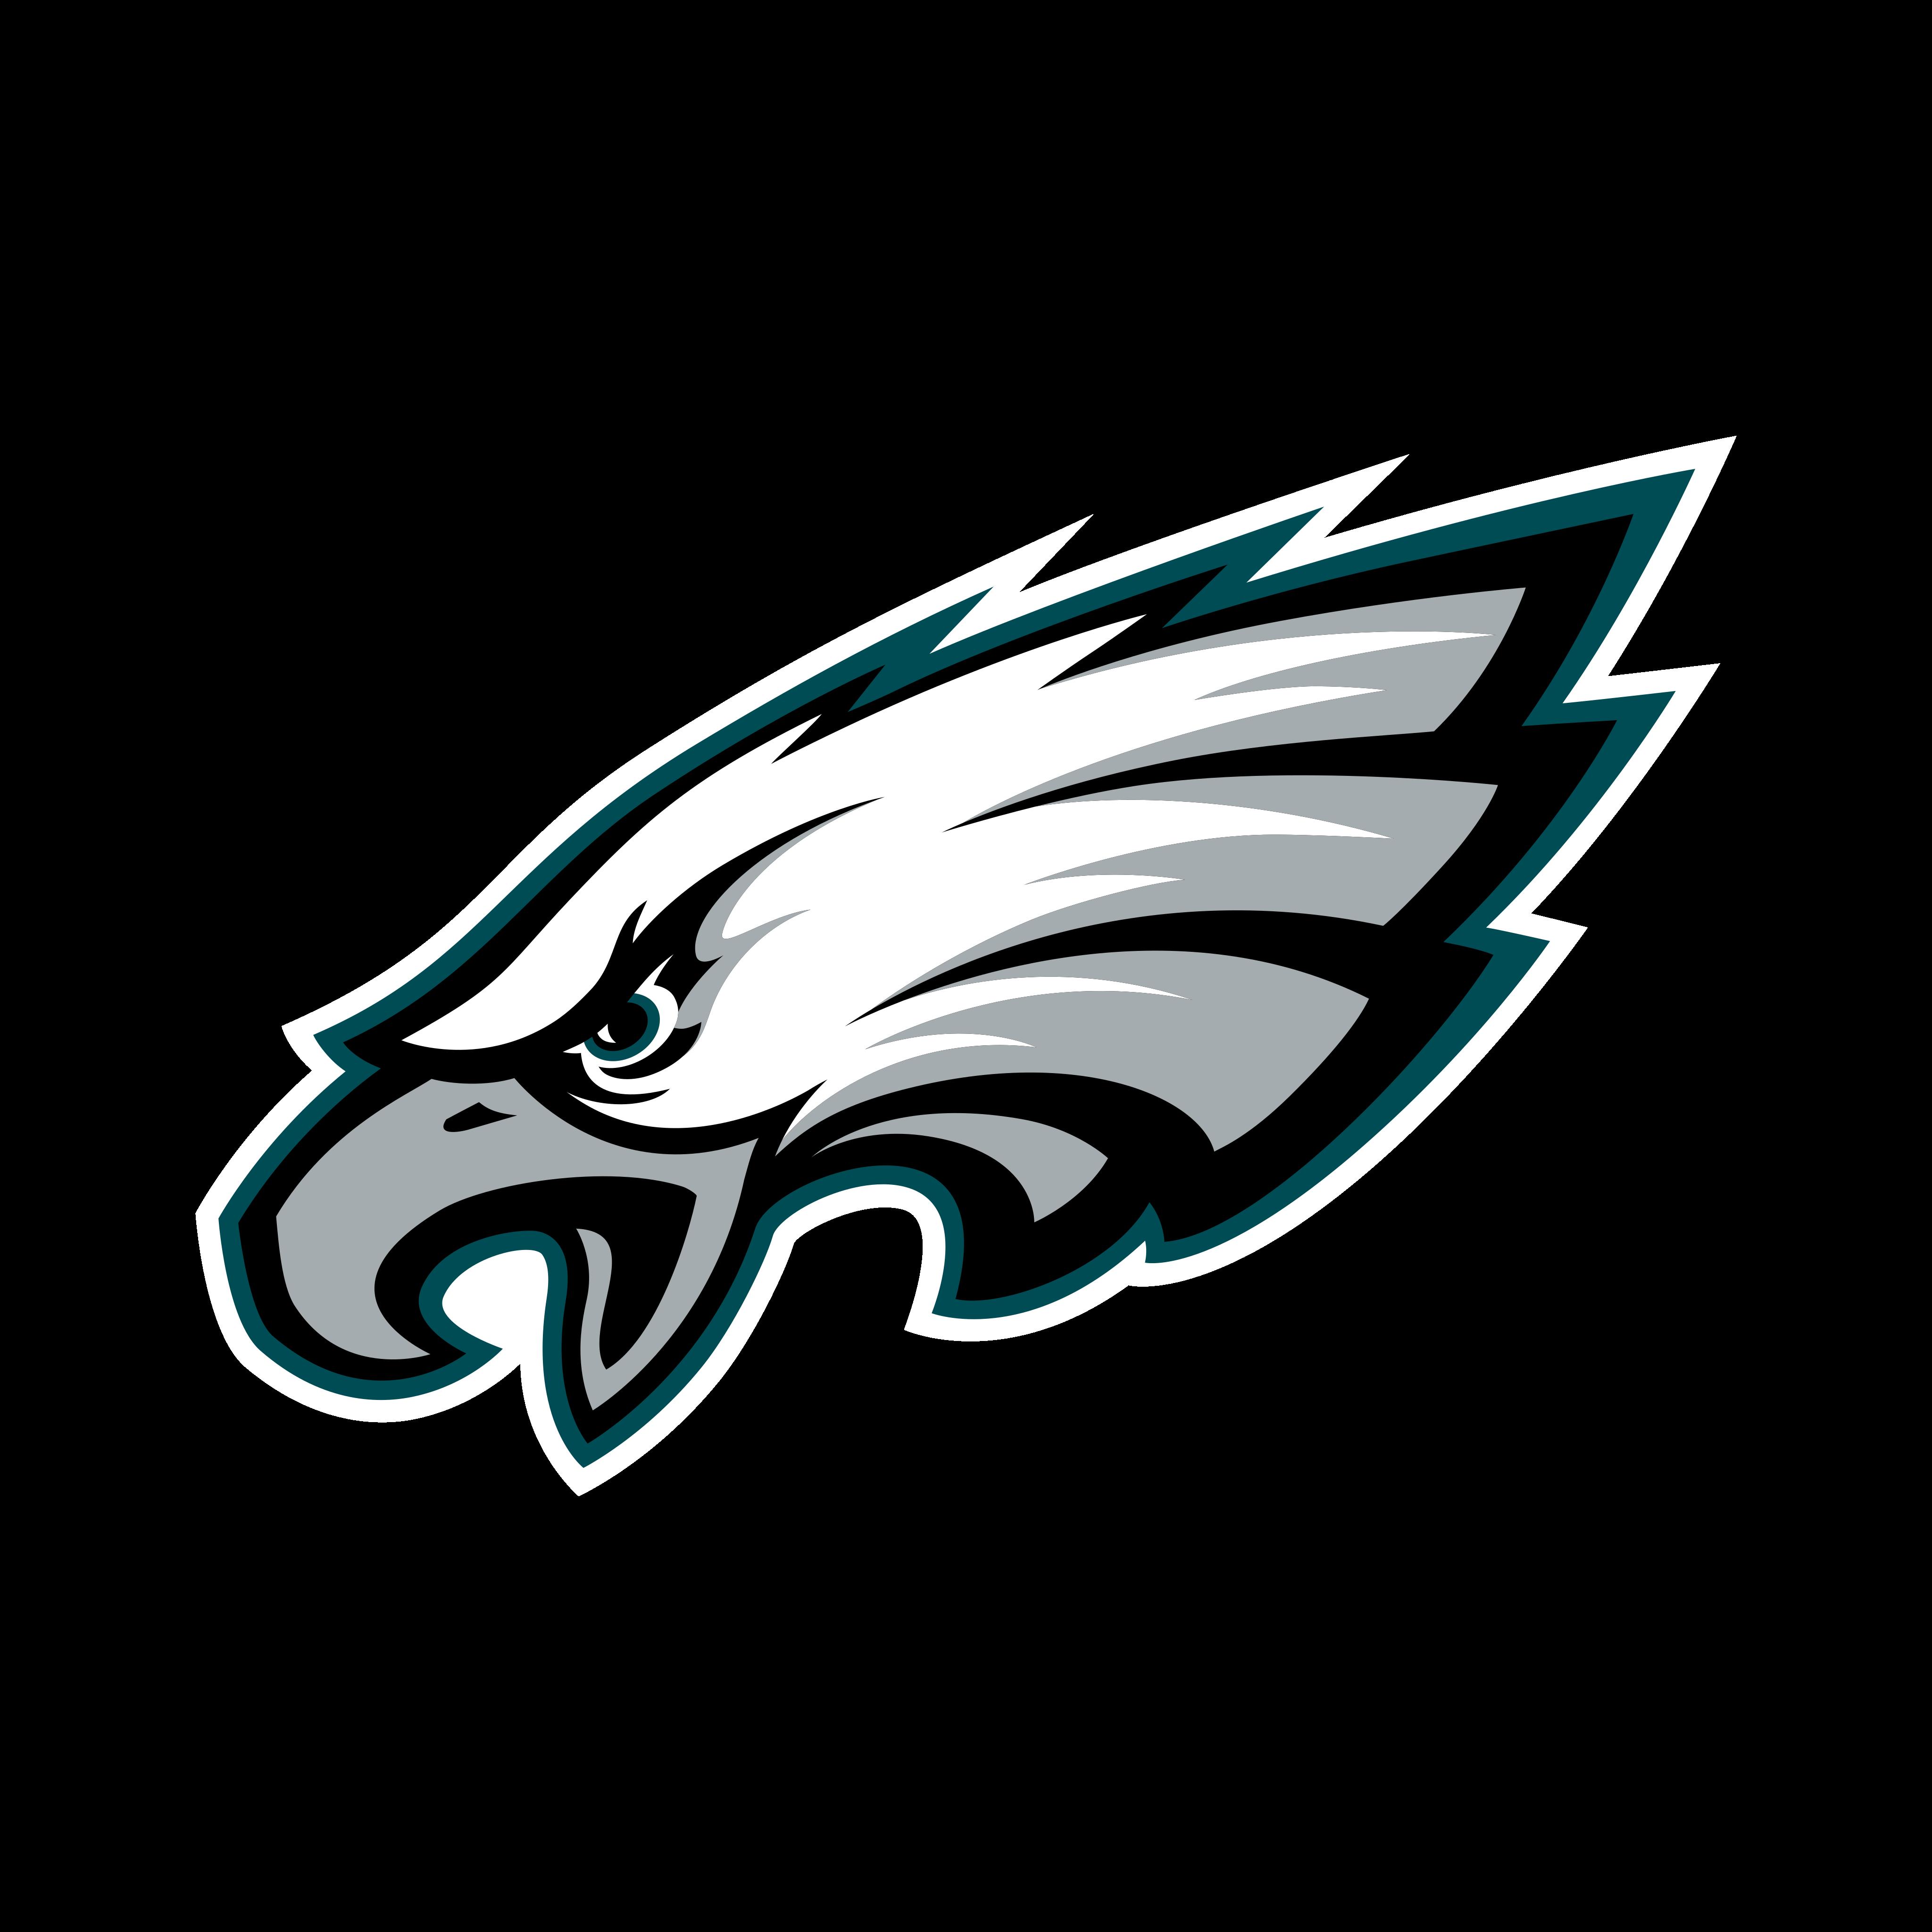 philadelphia eagles logo 0 - Philadelphia Eagles Logo